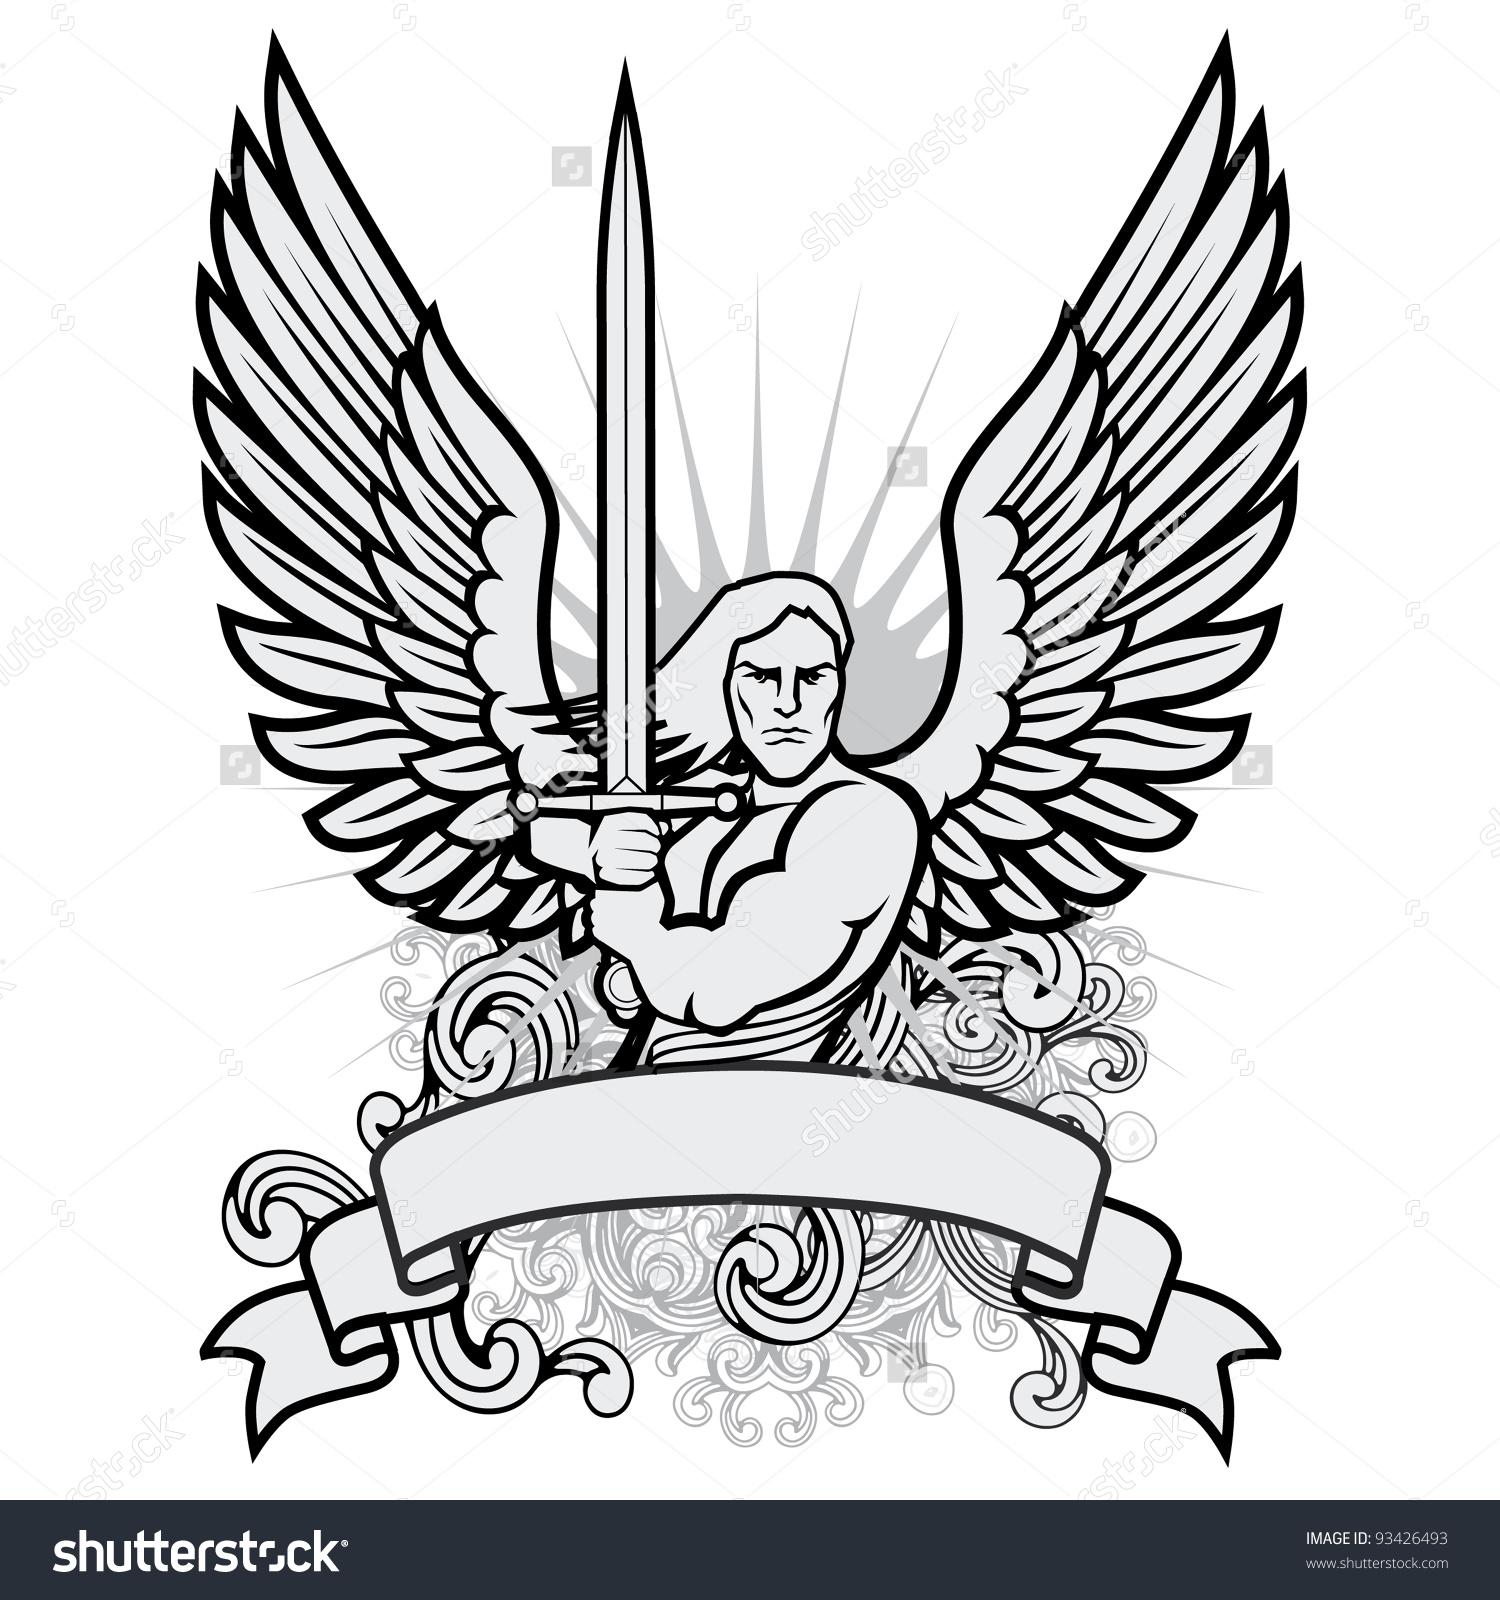 Angel Warrior coloring #1, Download drawings